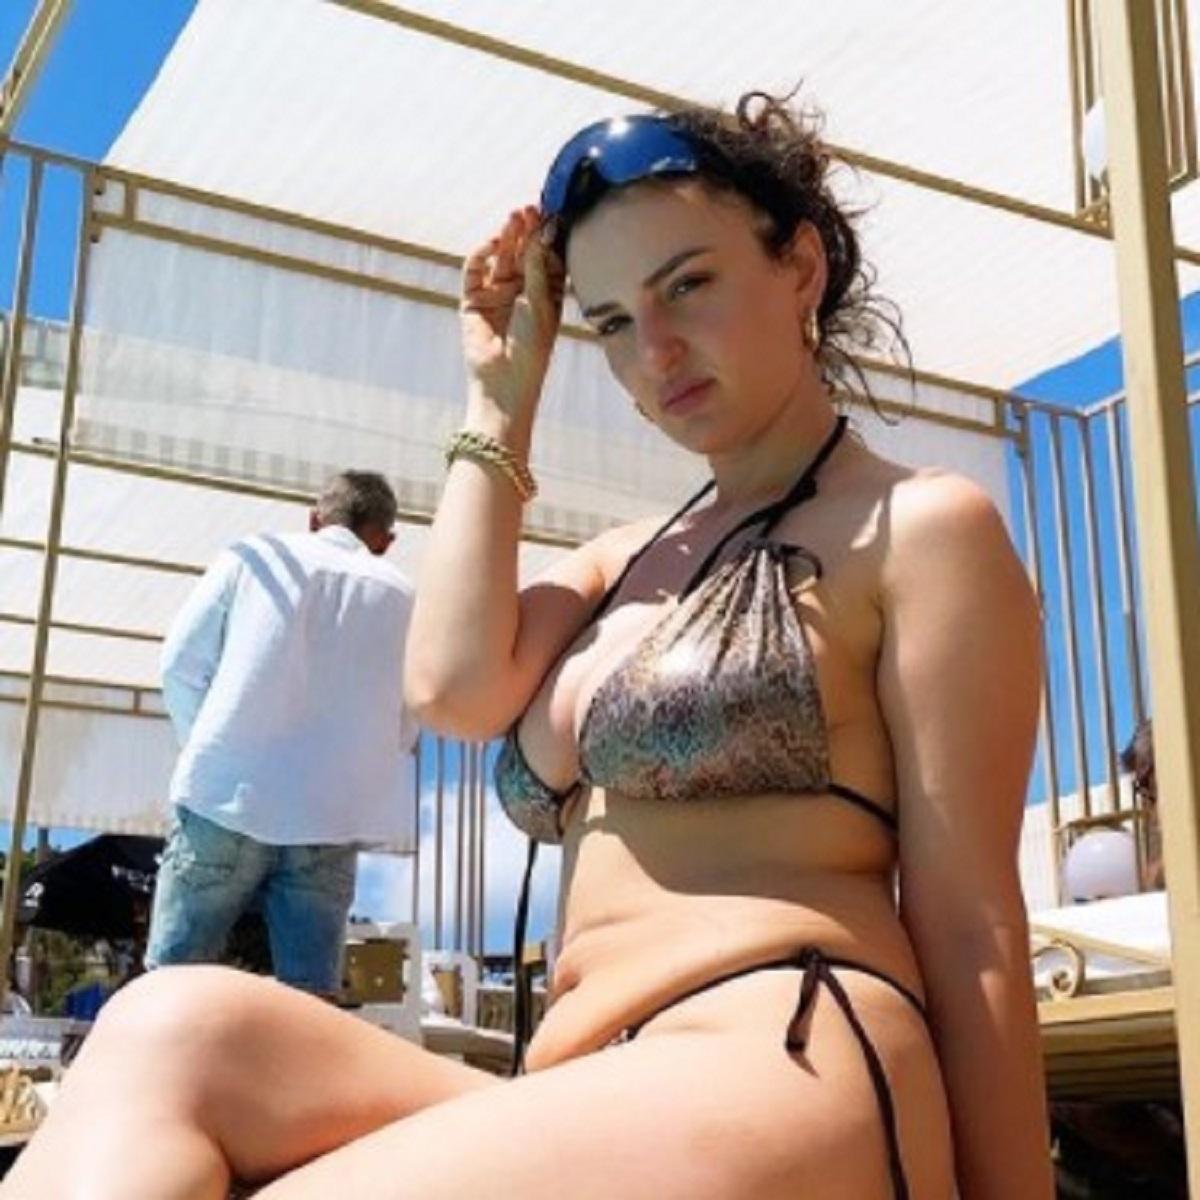 Arisa foto estate bikini bellezza cascata like